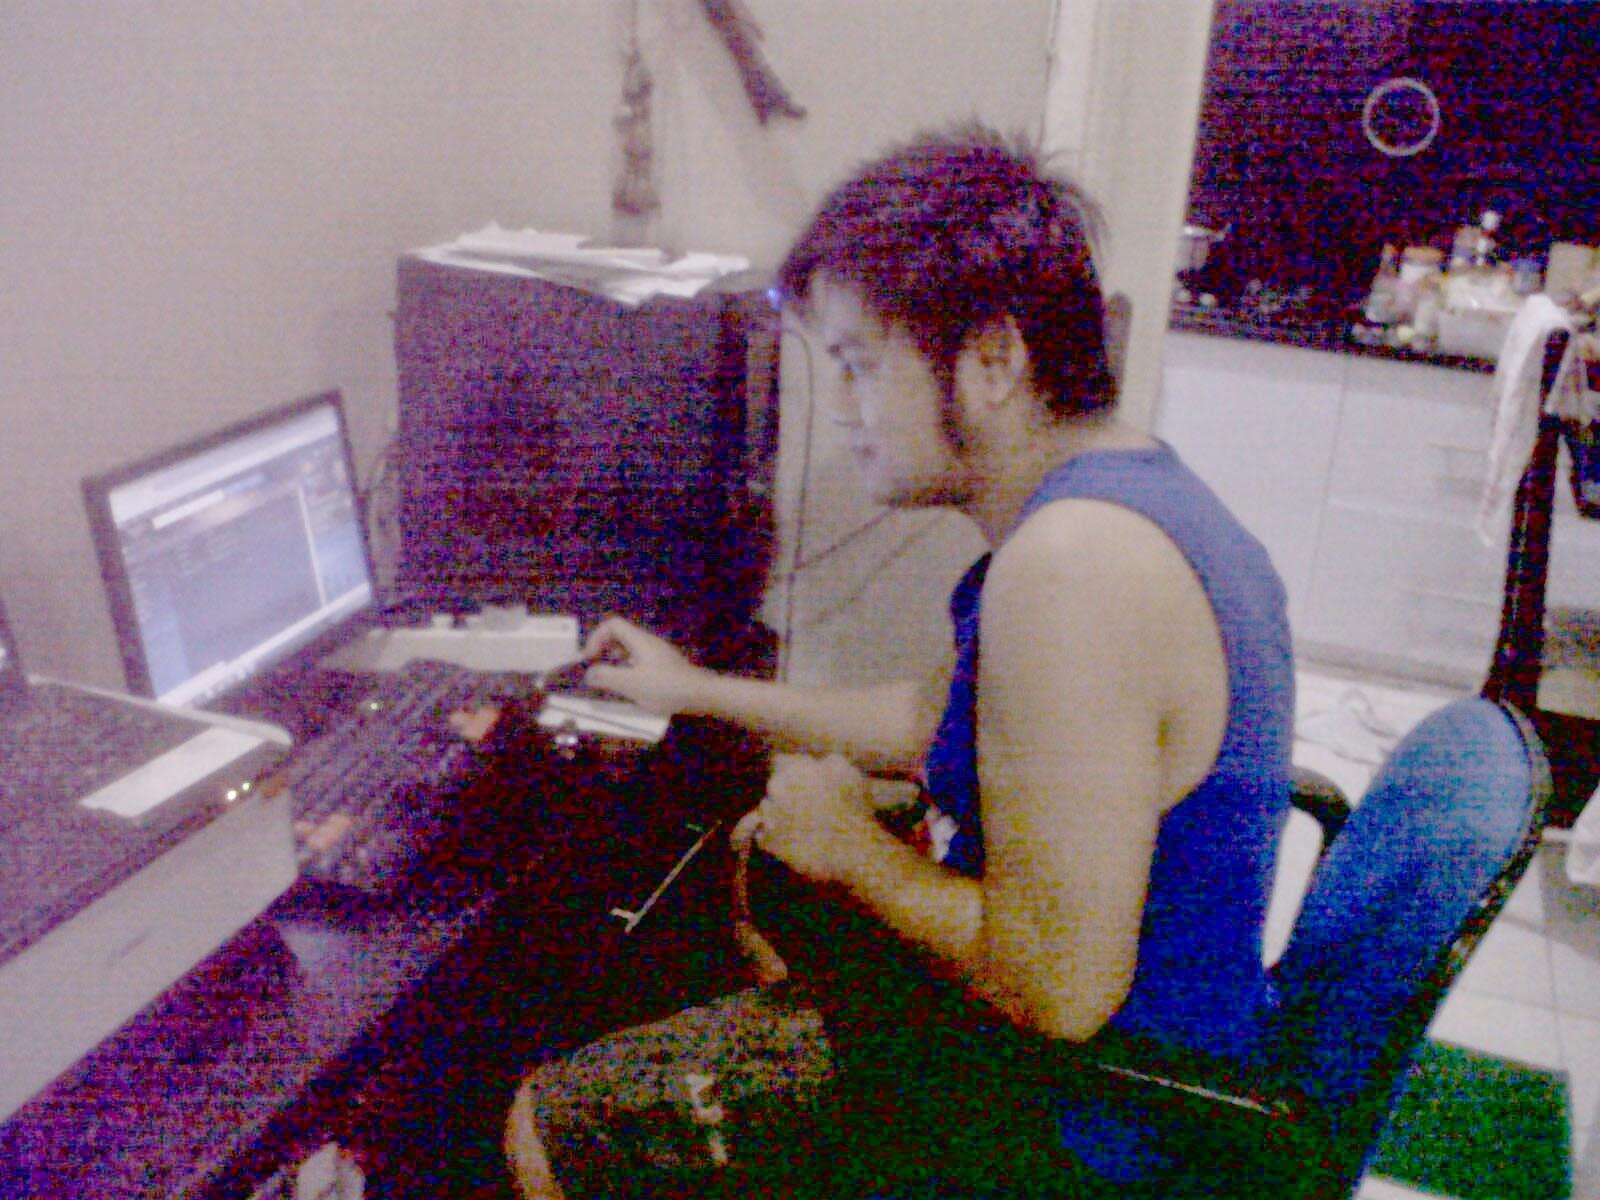 http://training-tik.blogspot.com/2014/07/private-microsoft-office-dan-internet.html?utm_source=BP_recent